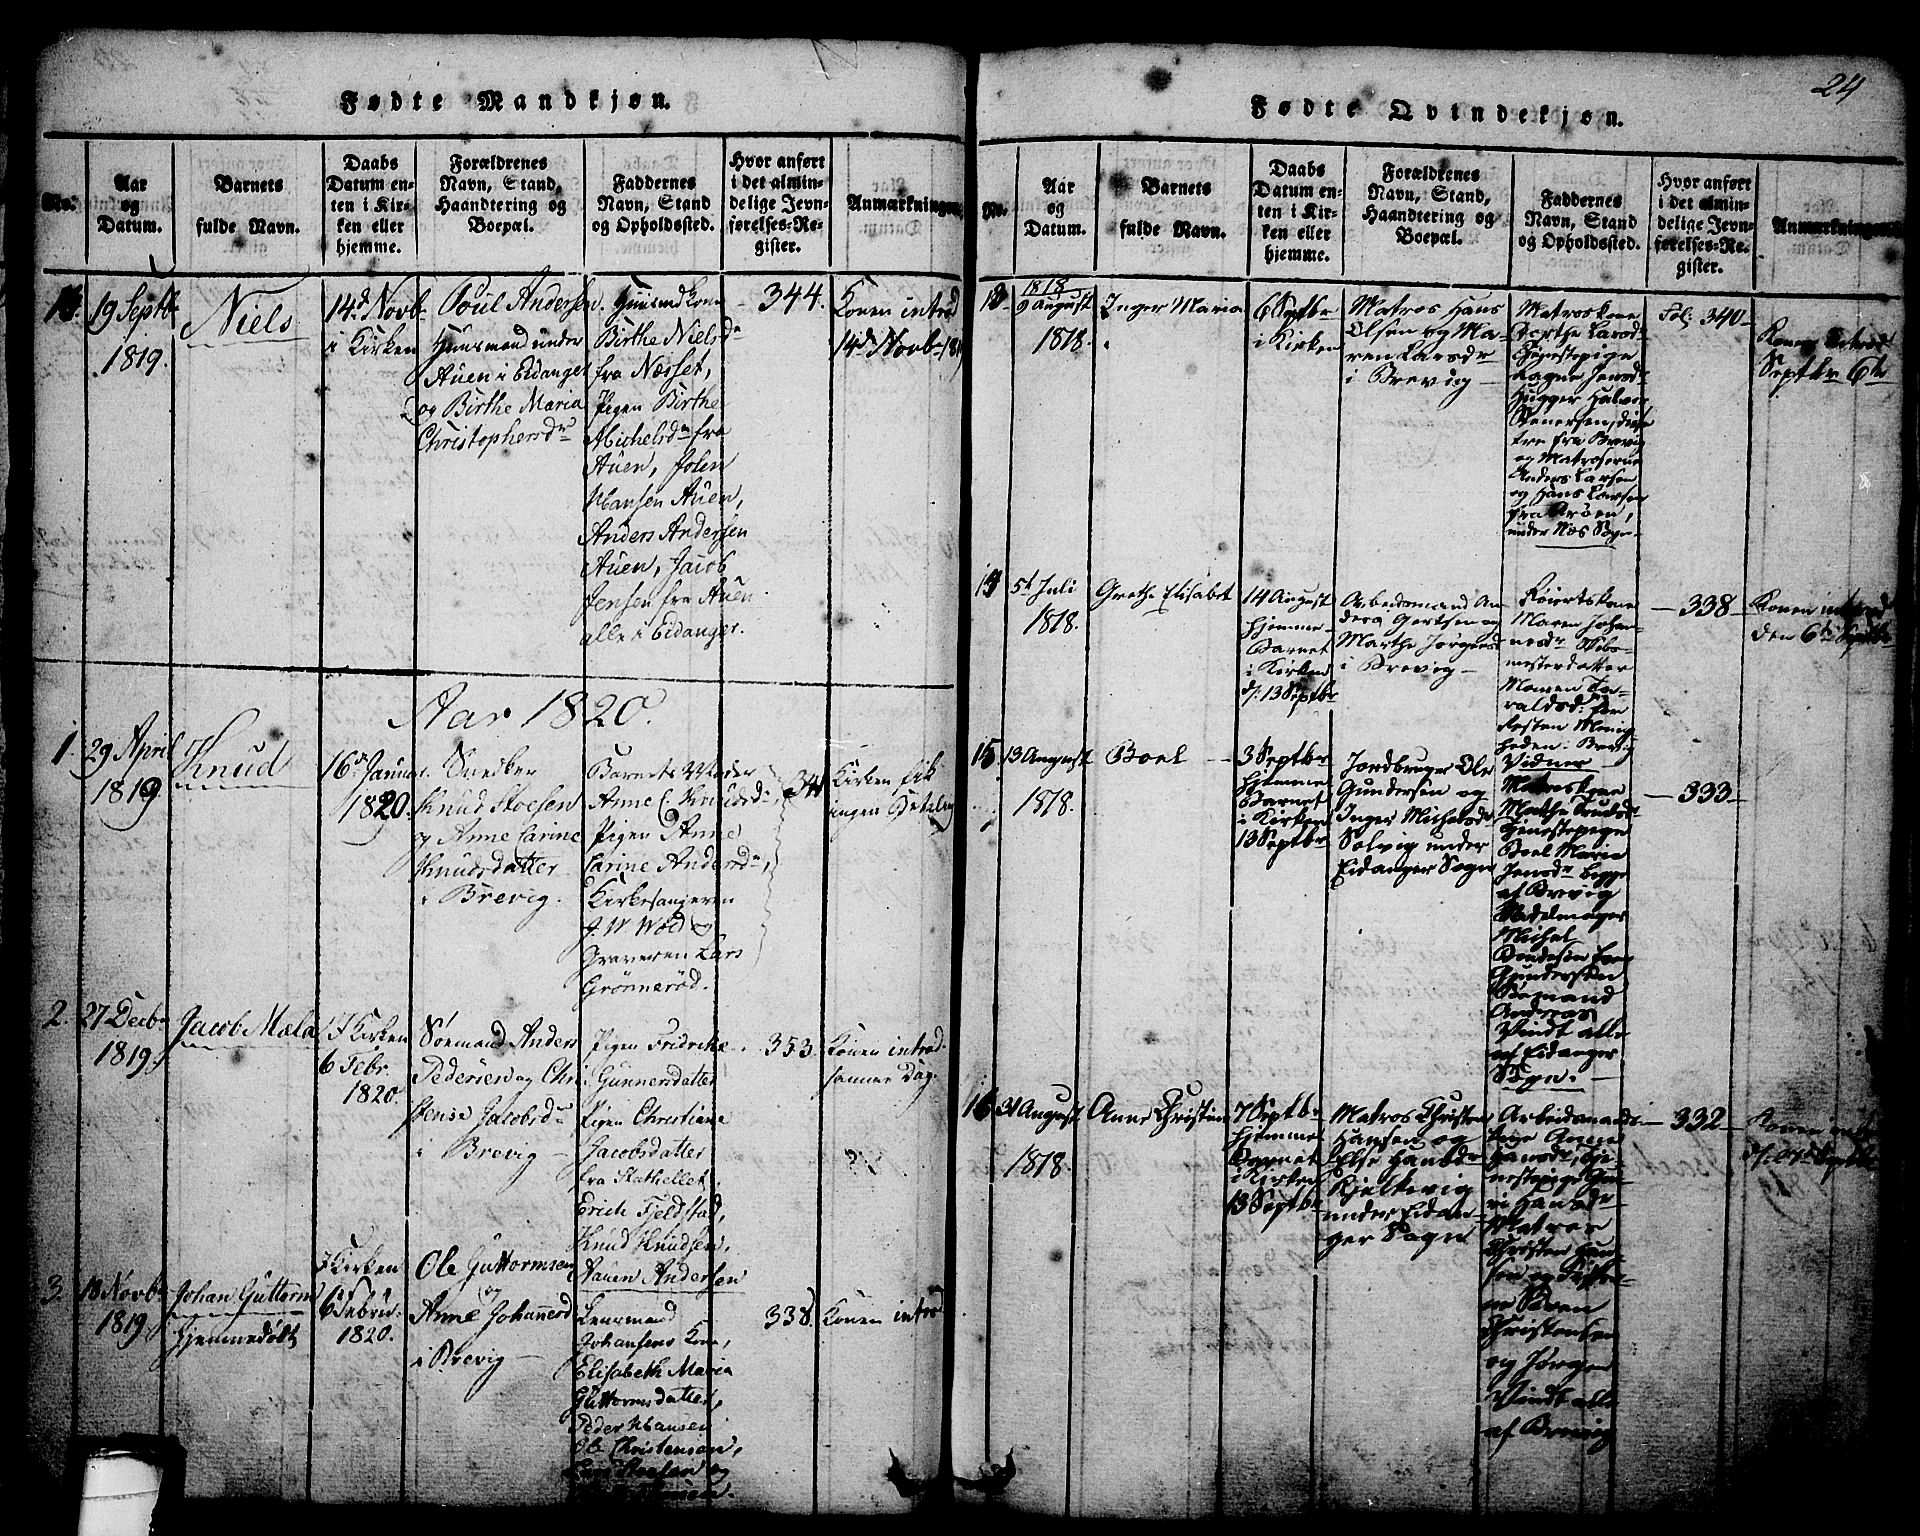 SAKO, Brevik kirkebøker, G/Ga/L0001: Klokkerbok nr. 1, 1814-1845, s. 24